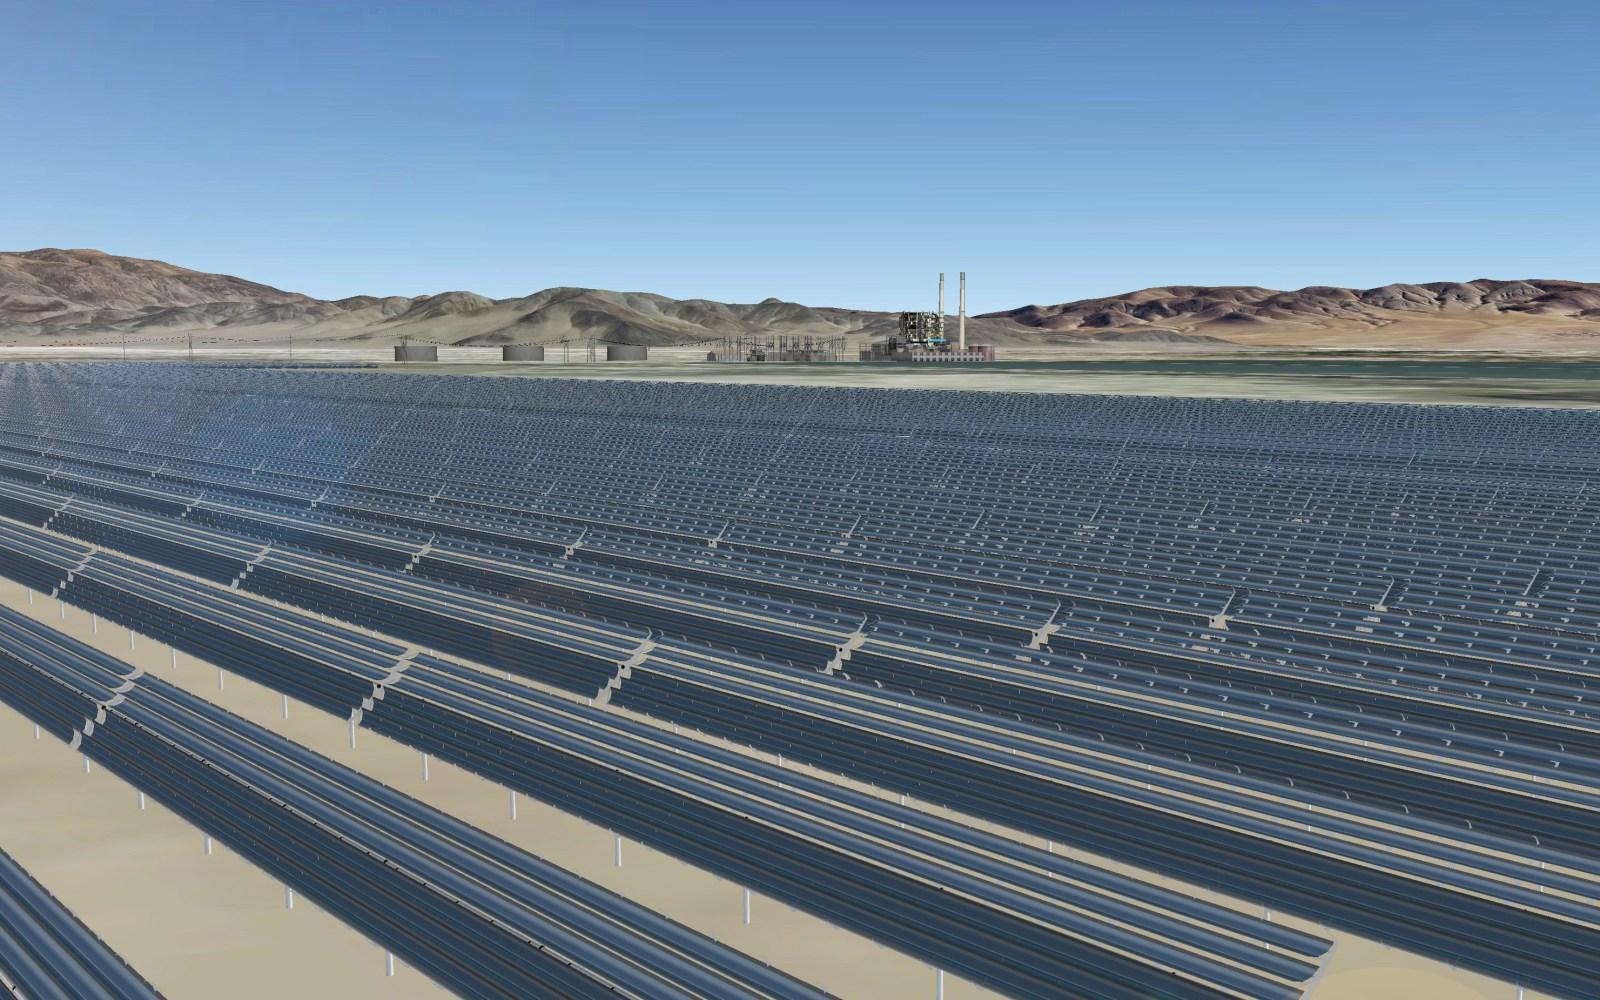 Apple plans 137-acre, 20 Megawatt solar array adjacent to its new Reno data center in partnership with NV Energy